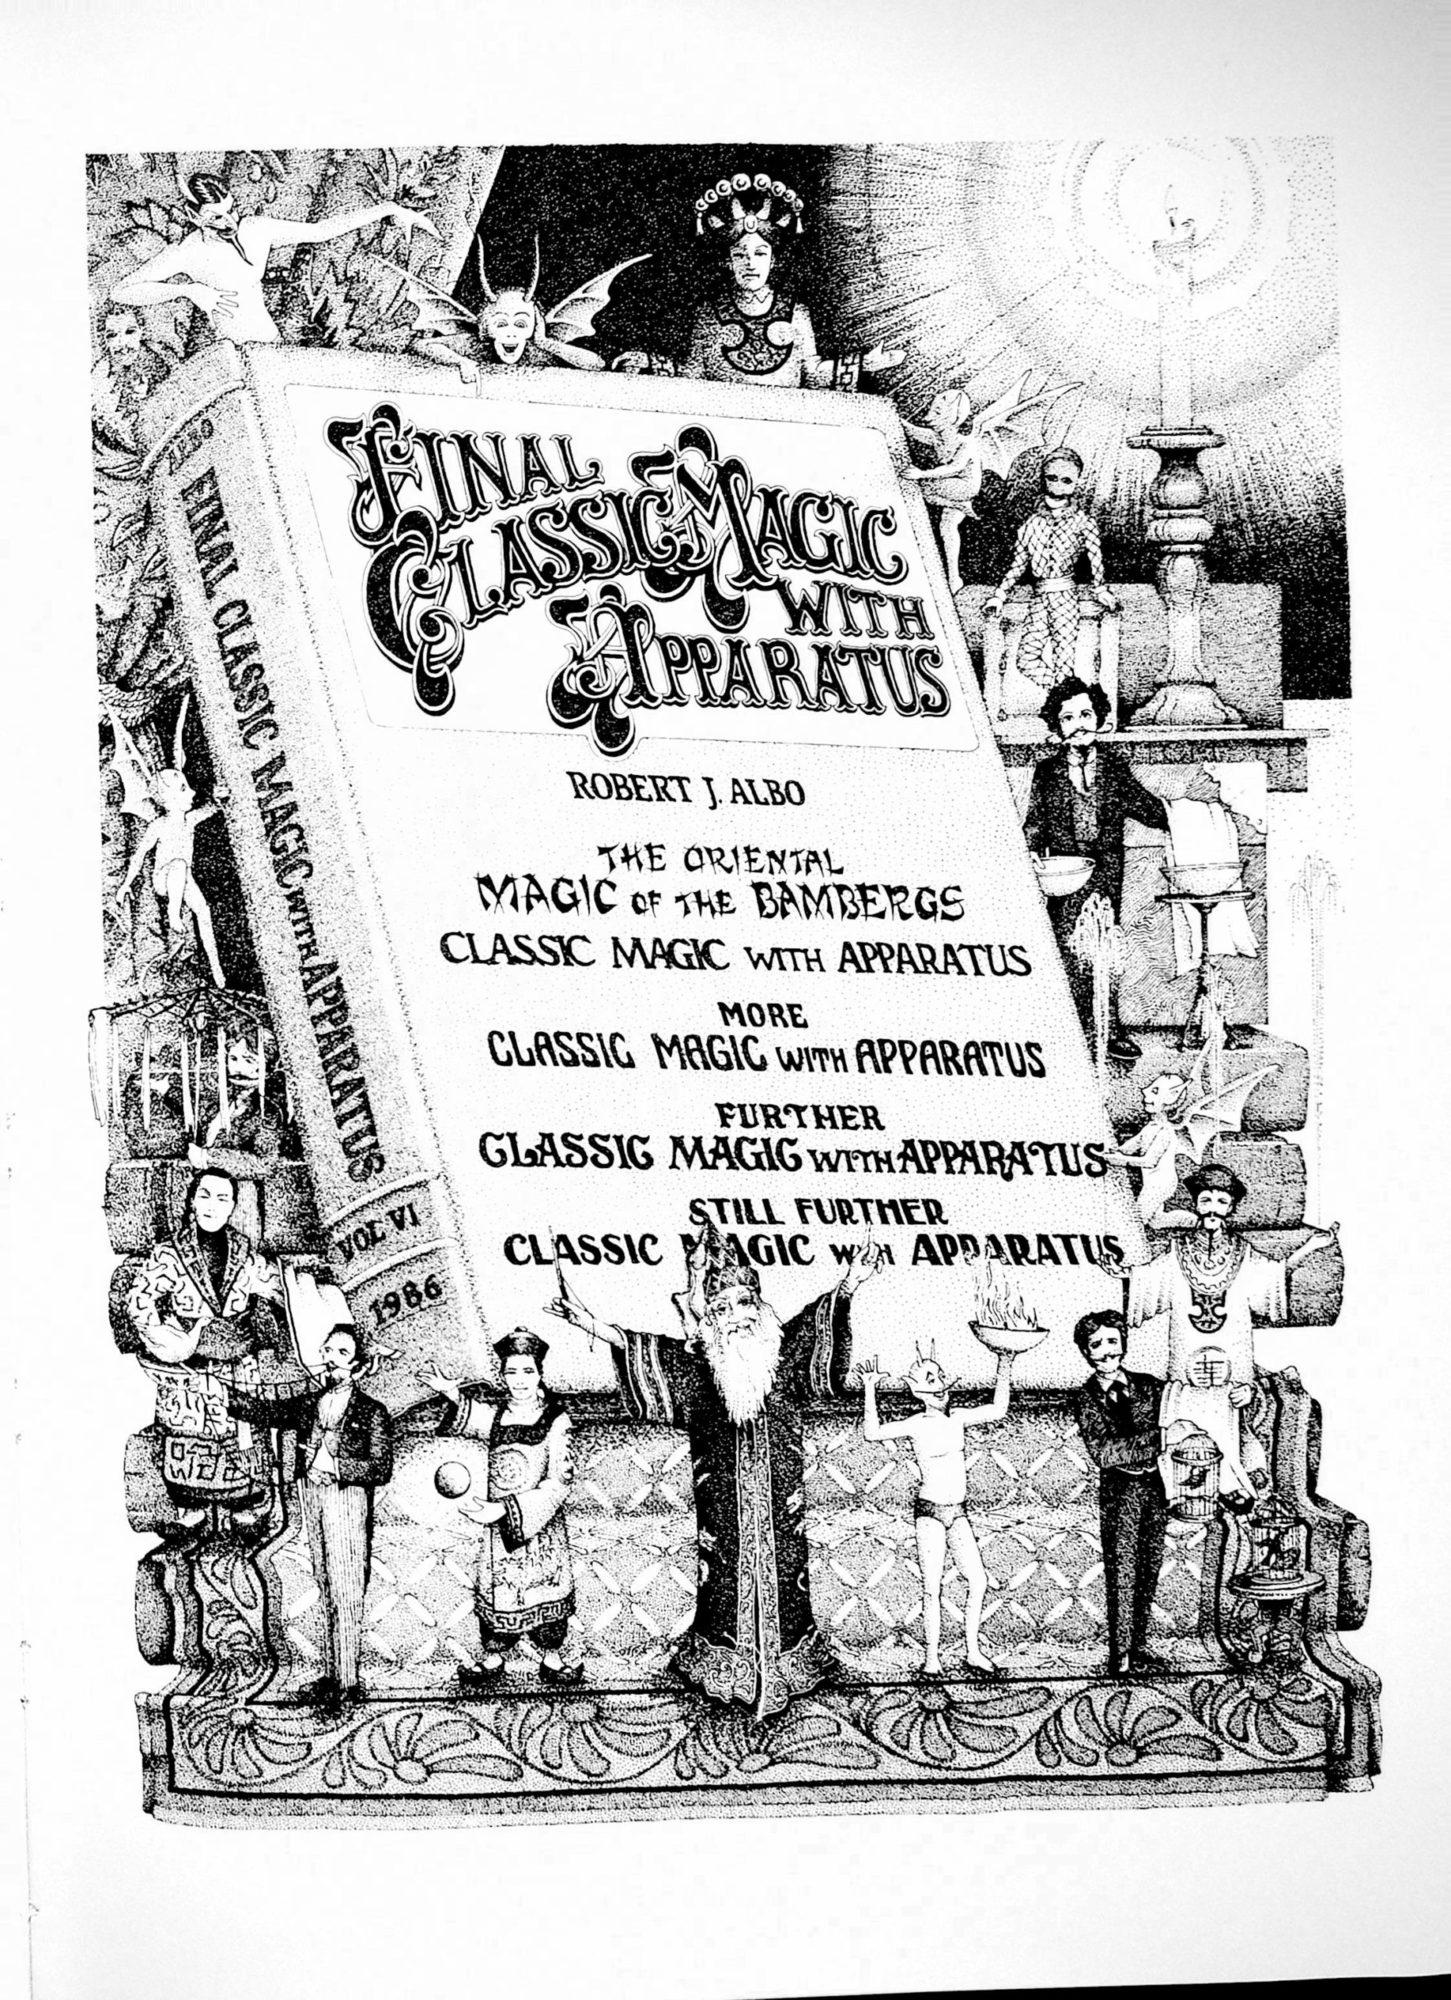 Albo 06 - Final Classic Magic With Apparatus by Robert J. Albo